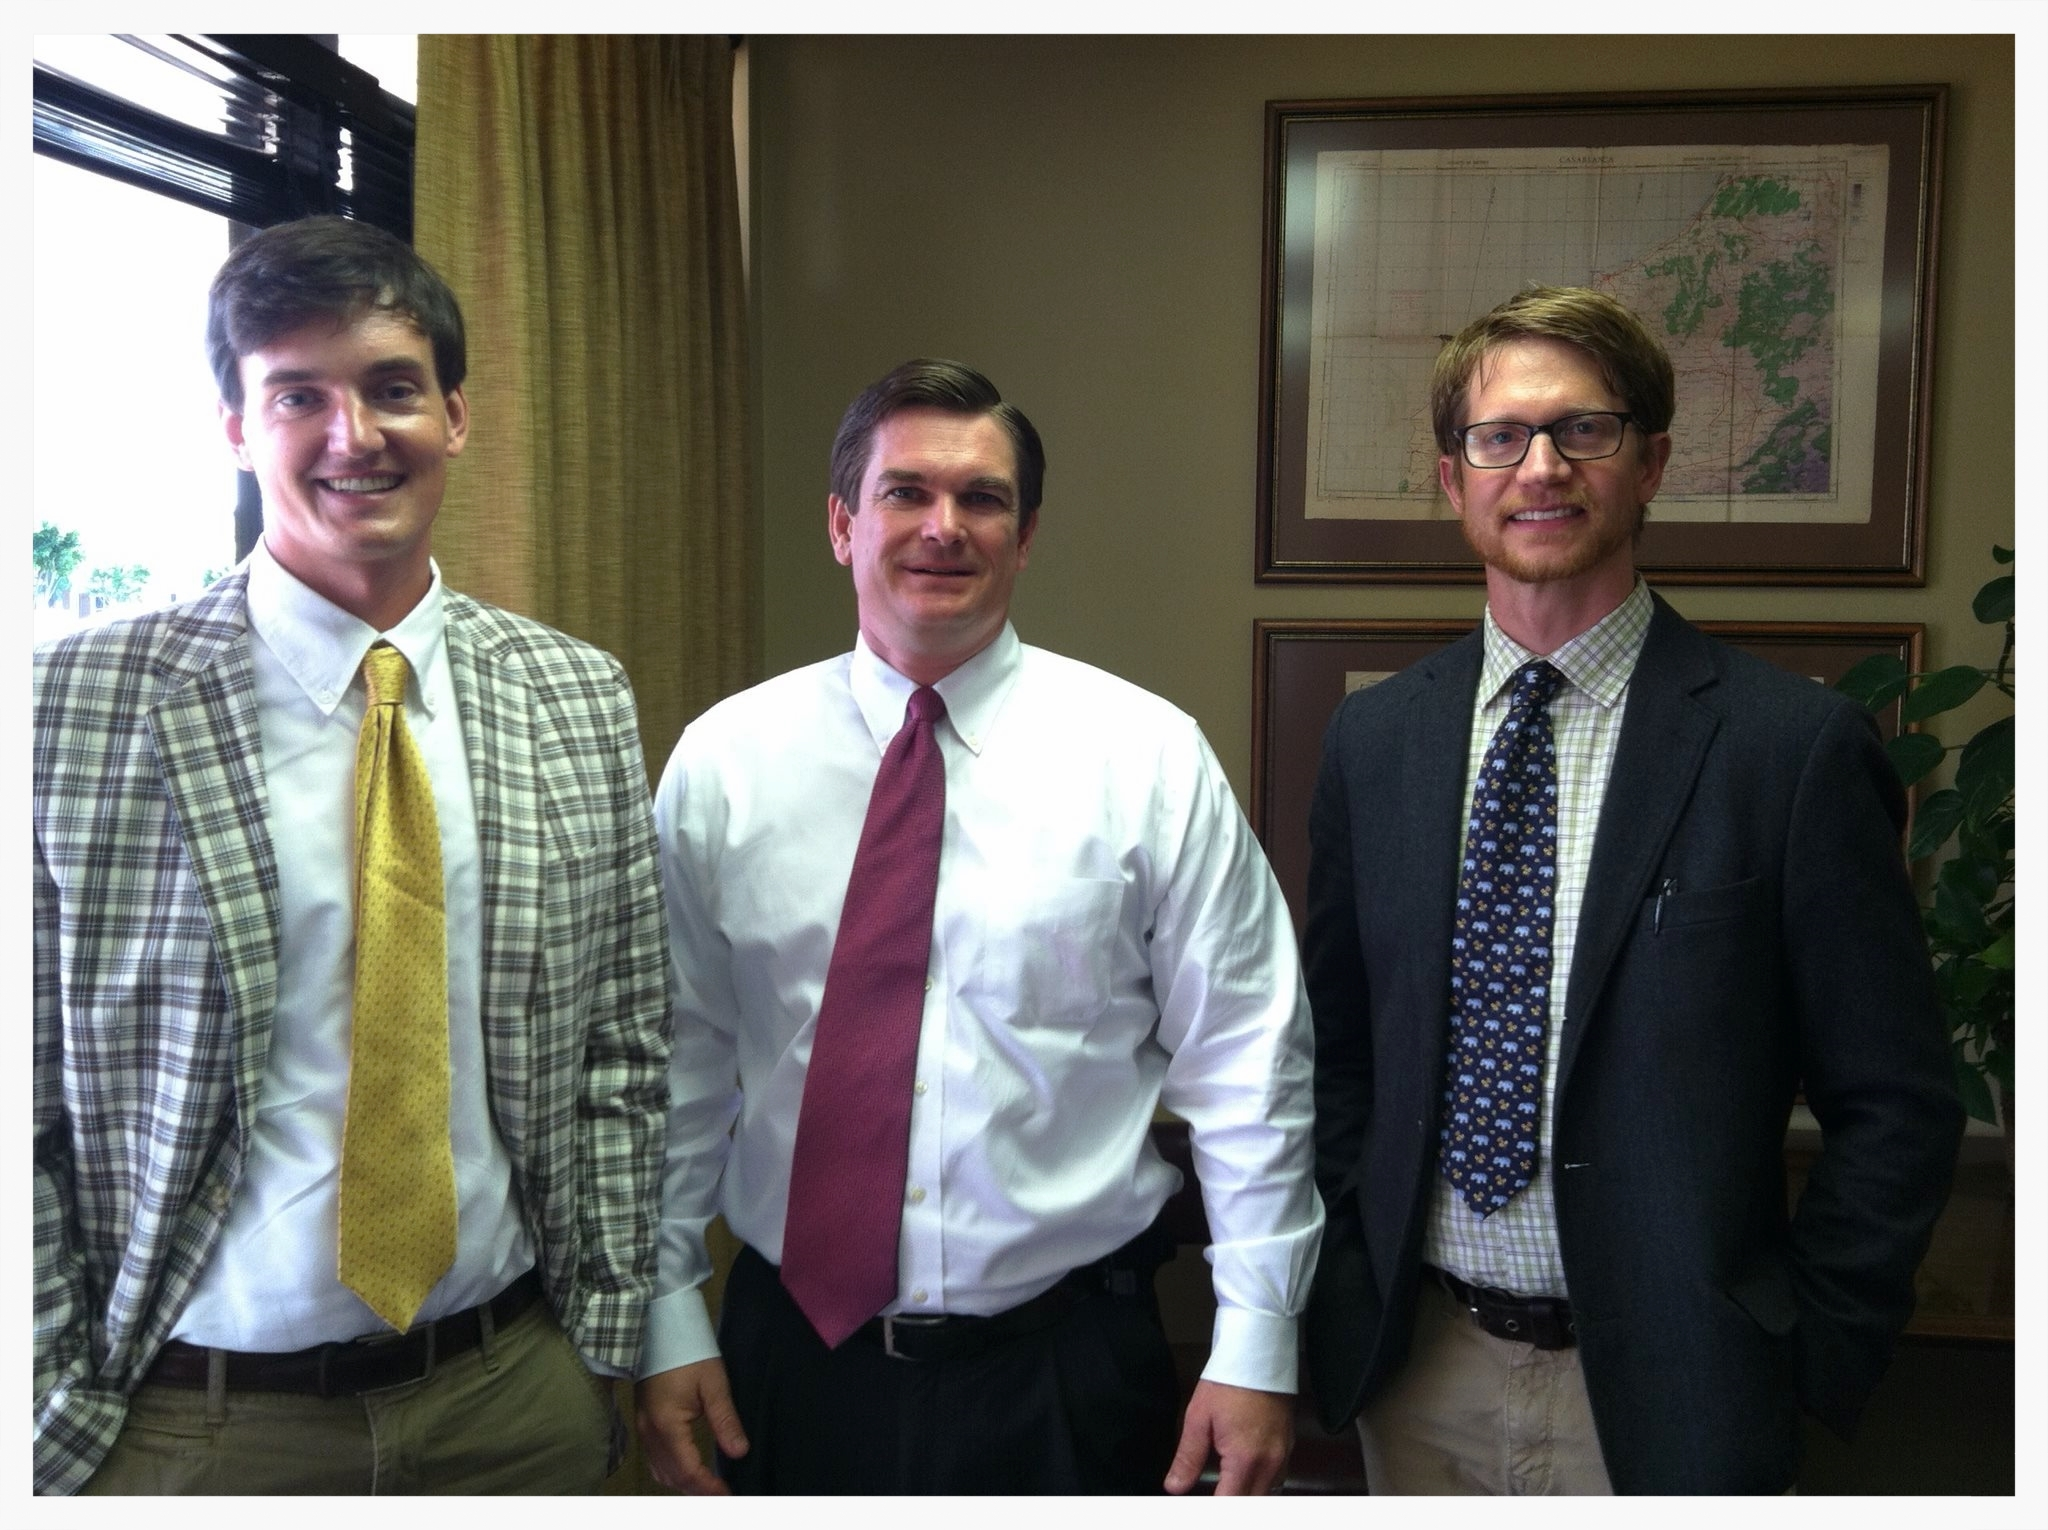 Donn Cooper, U.S. Representative Austin Scott, and Michael Wall, Georgia Organics Director of Programs